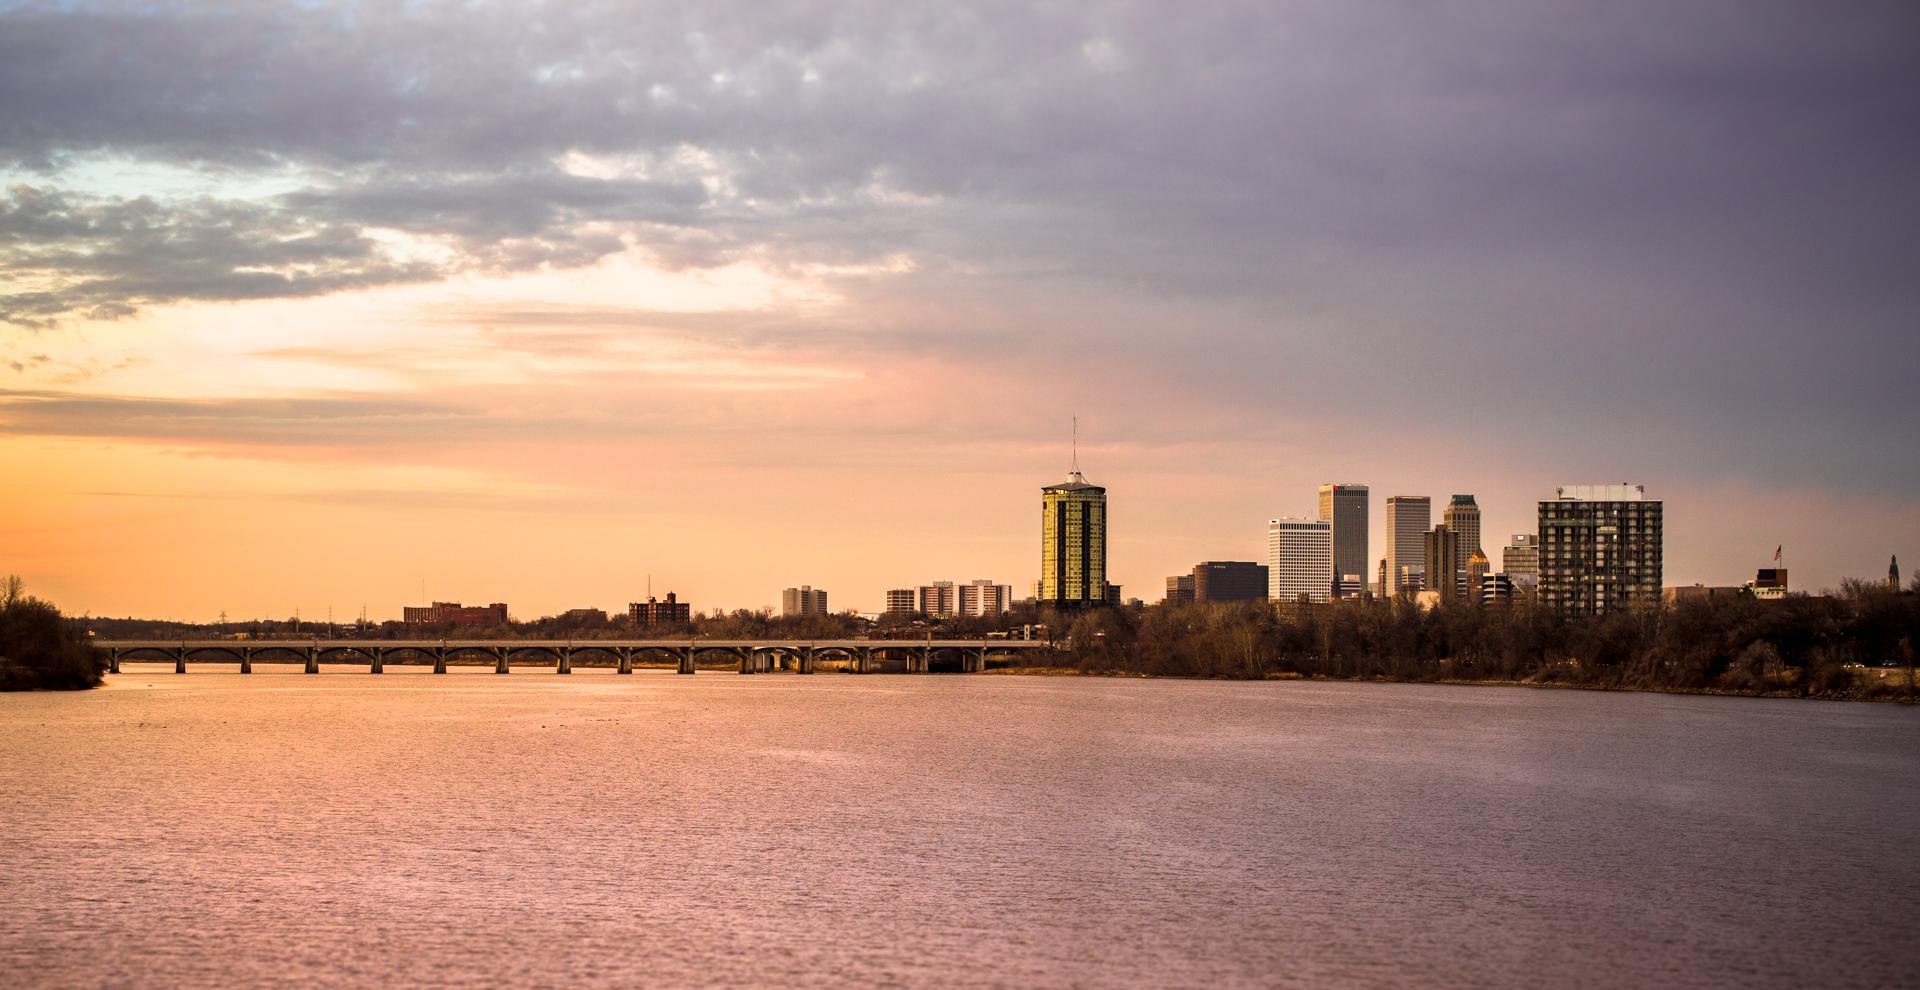 6I8A8017-Edit-1080p-Downtown Tulsa.jpg